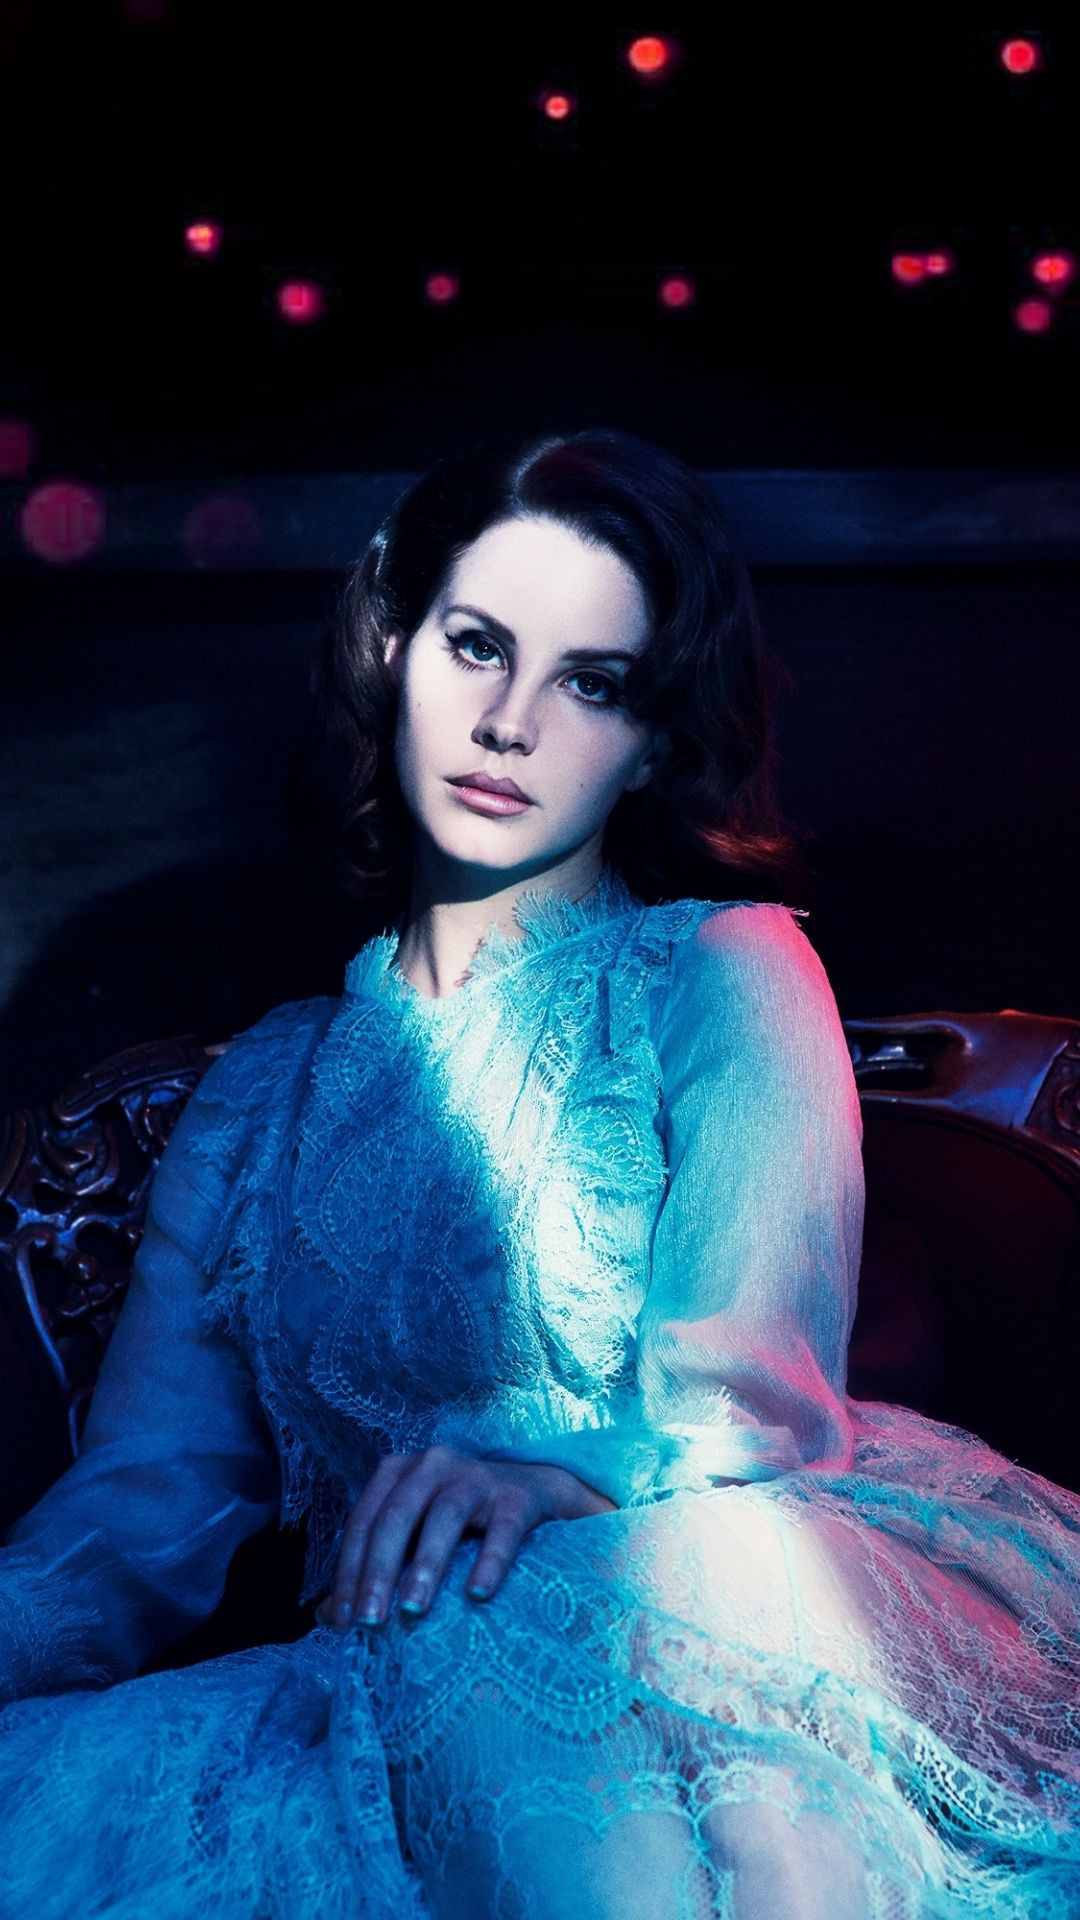 Lana Del Rey Celebrity Complex Magazine 1080x1920 Wallpaper Celebrity Wallpapers Lana Del Rey Iphone Wallpaper